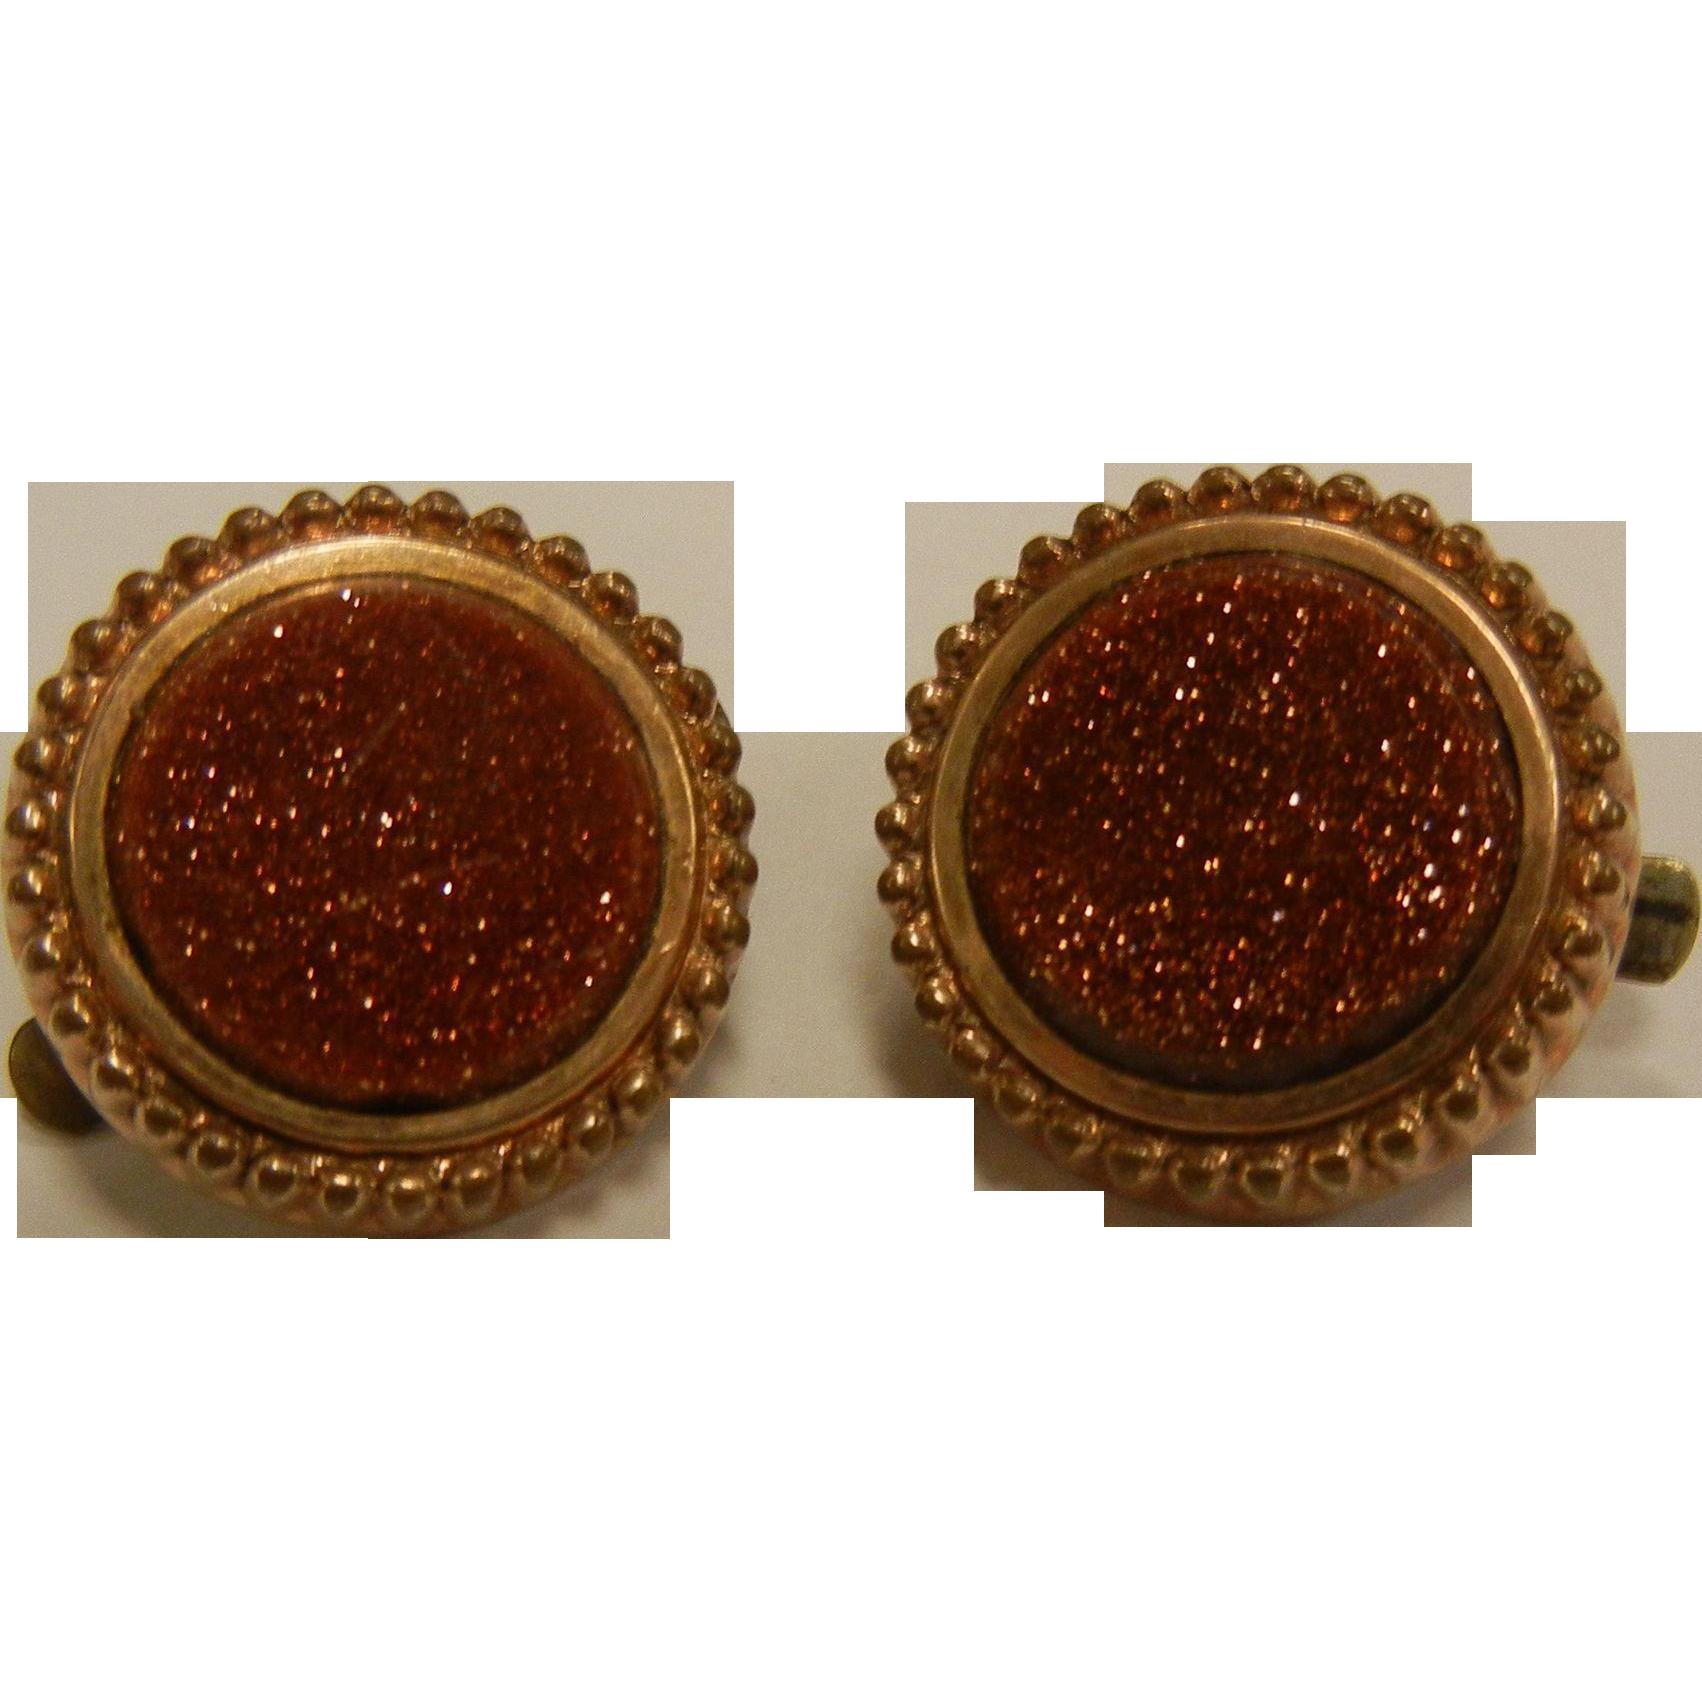 Vintage Goldstone Cuff Links